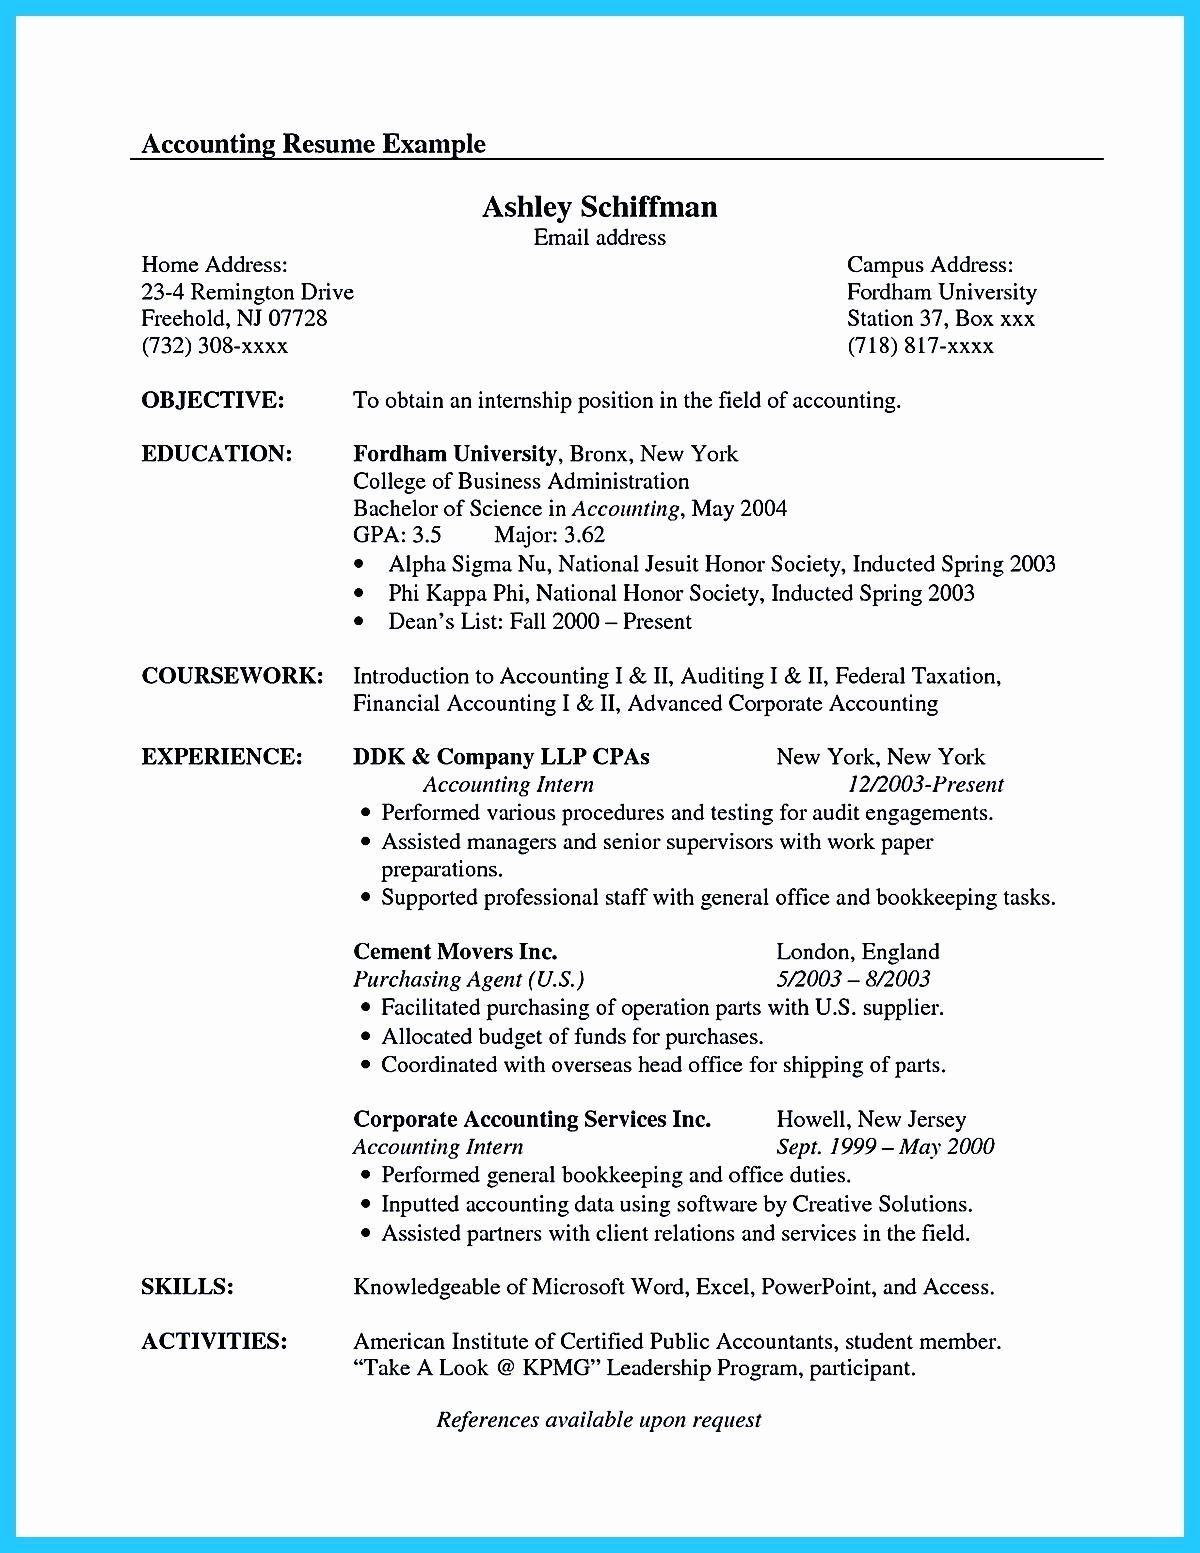 Accounting Internship Resume Sample Awesome 30 Accounting